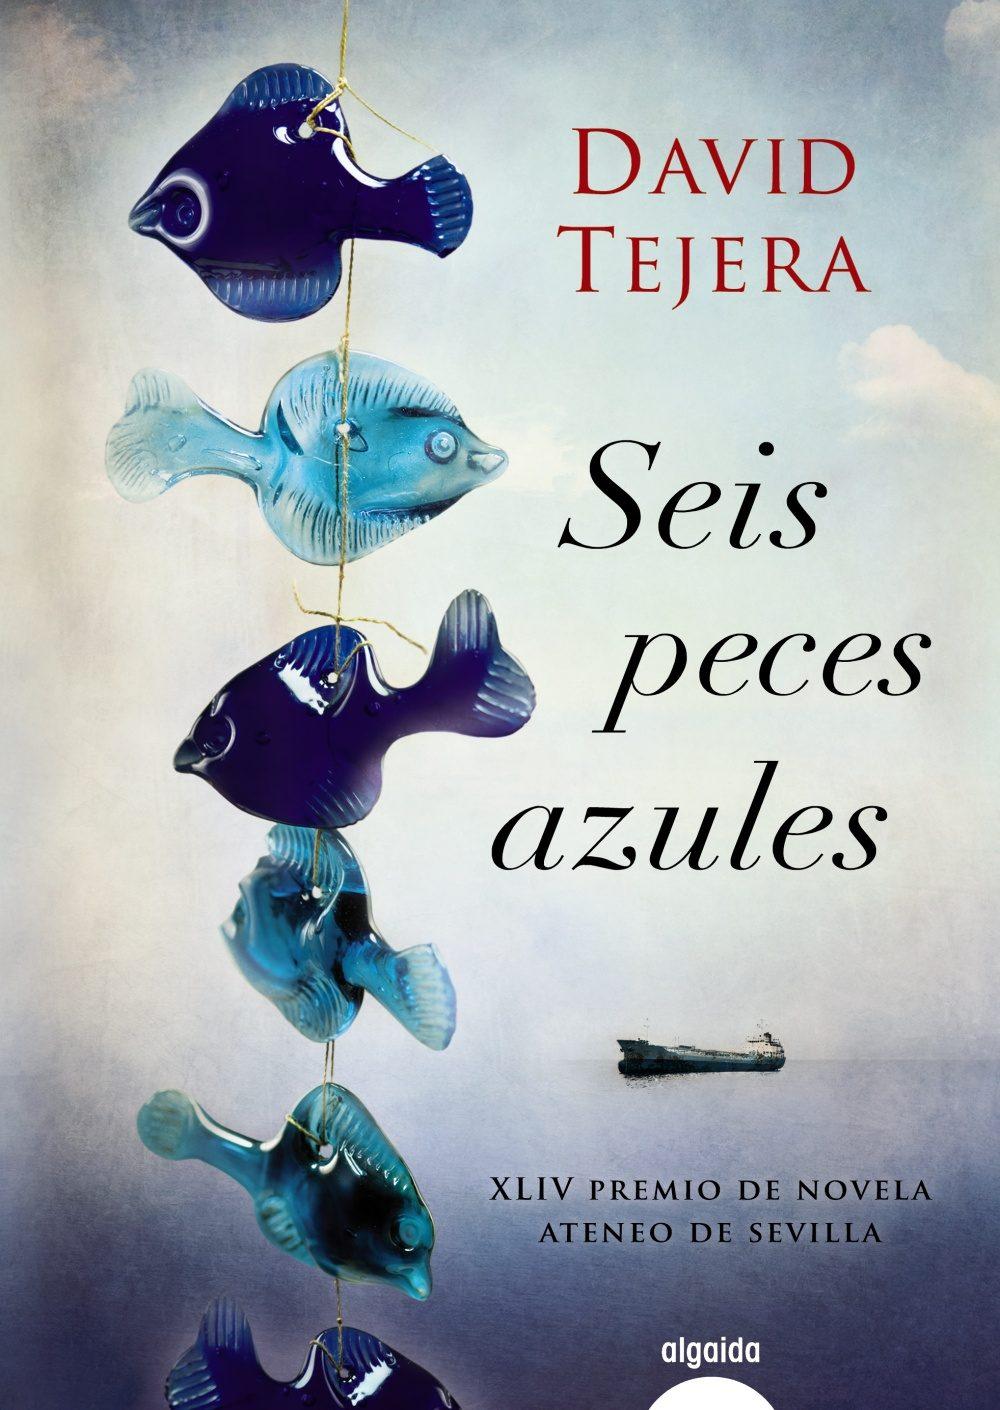 https://labibliotecadebella.blogspot.com/2018/07/resena-seis-peces-azules-david-tejera.html